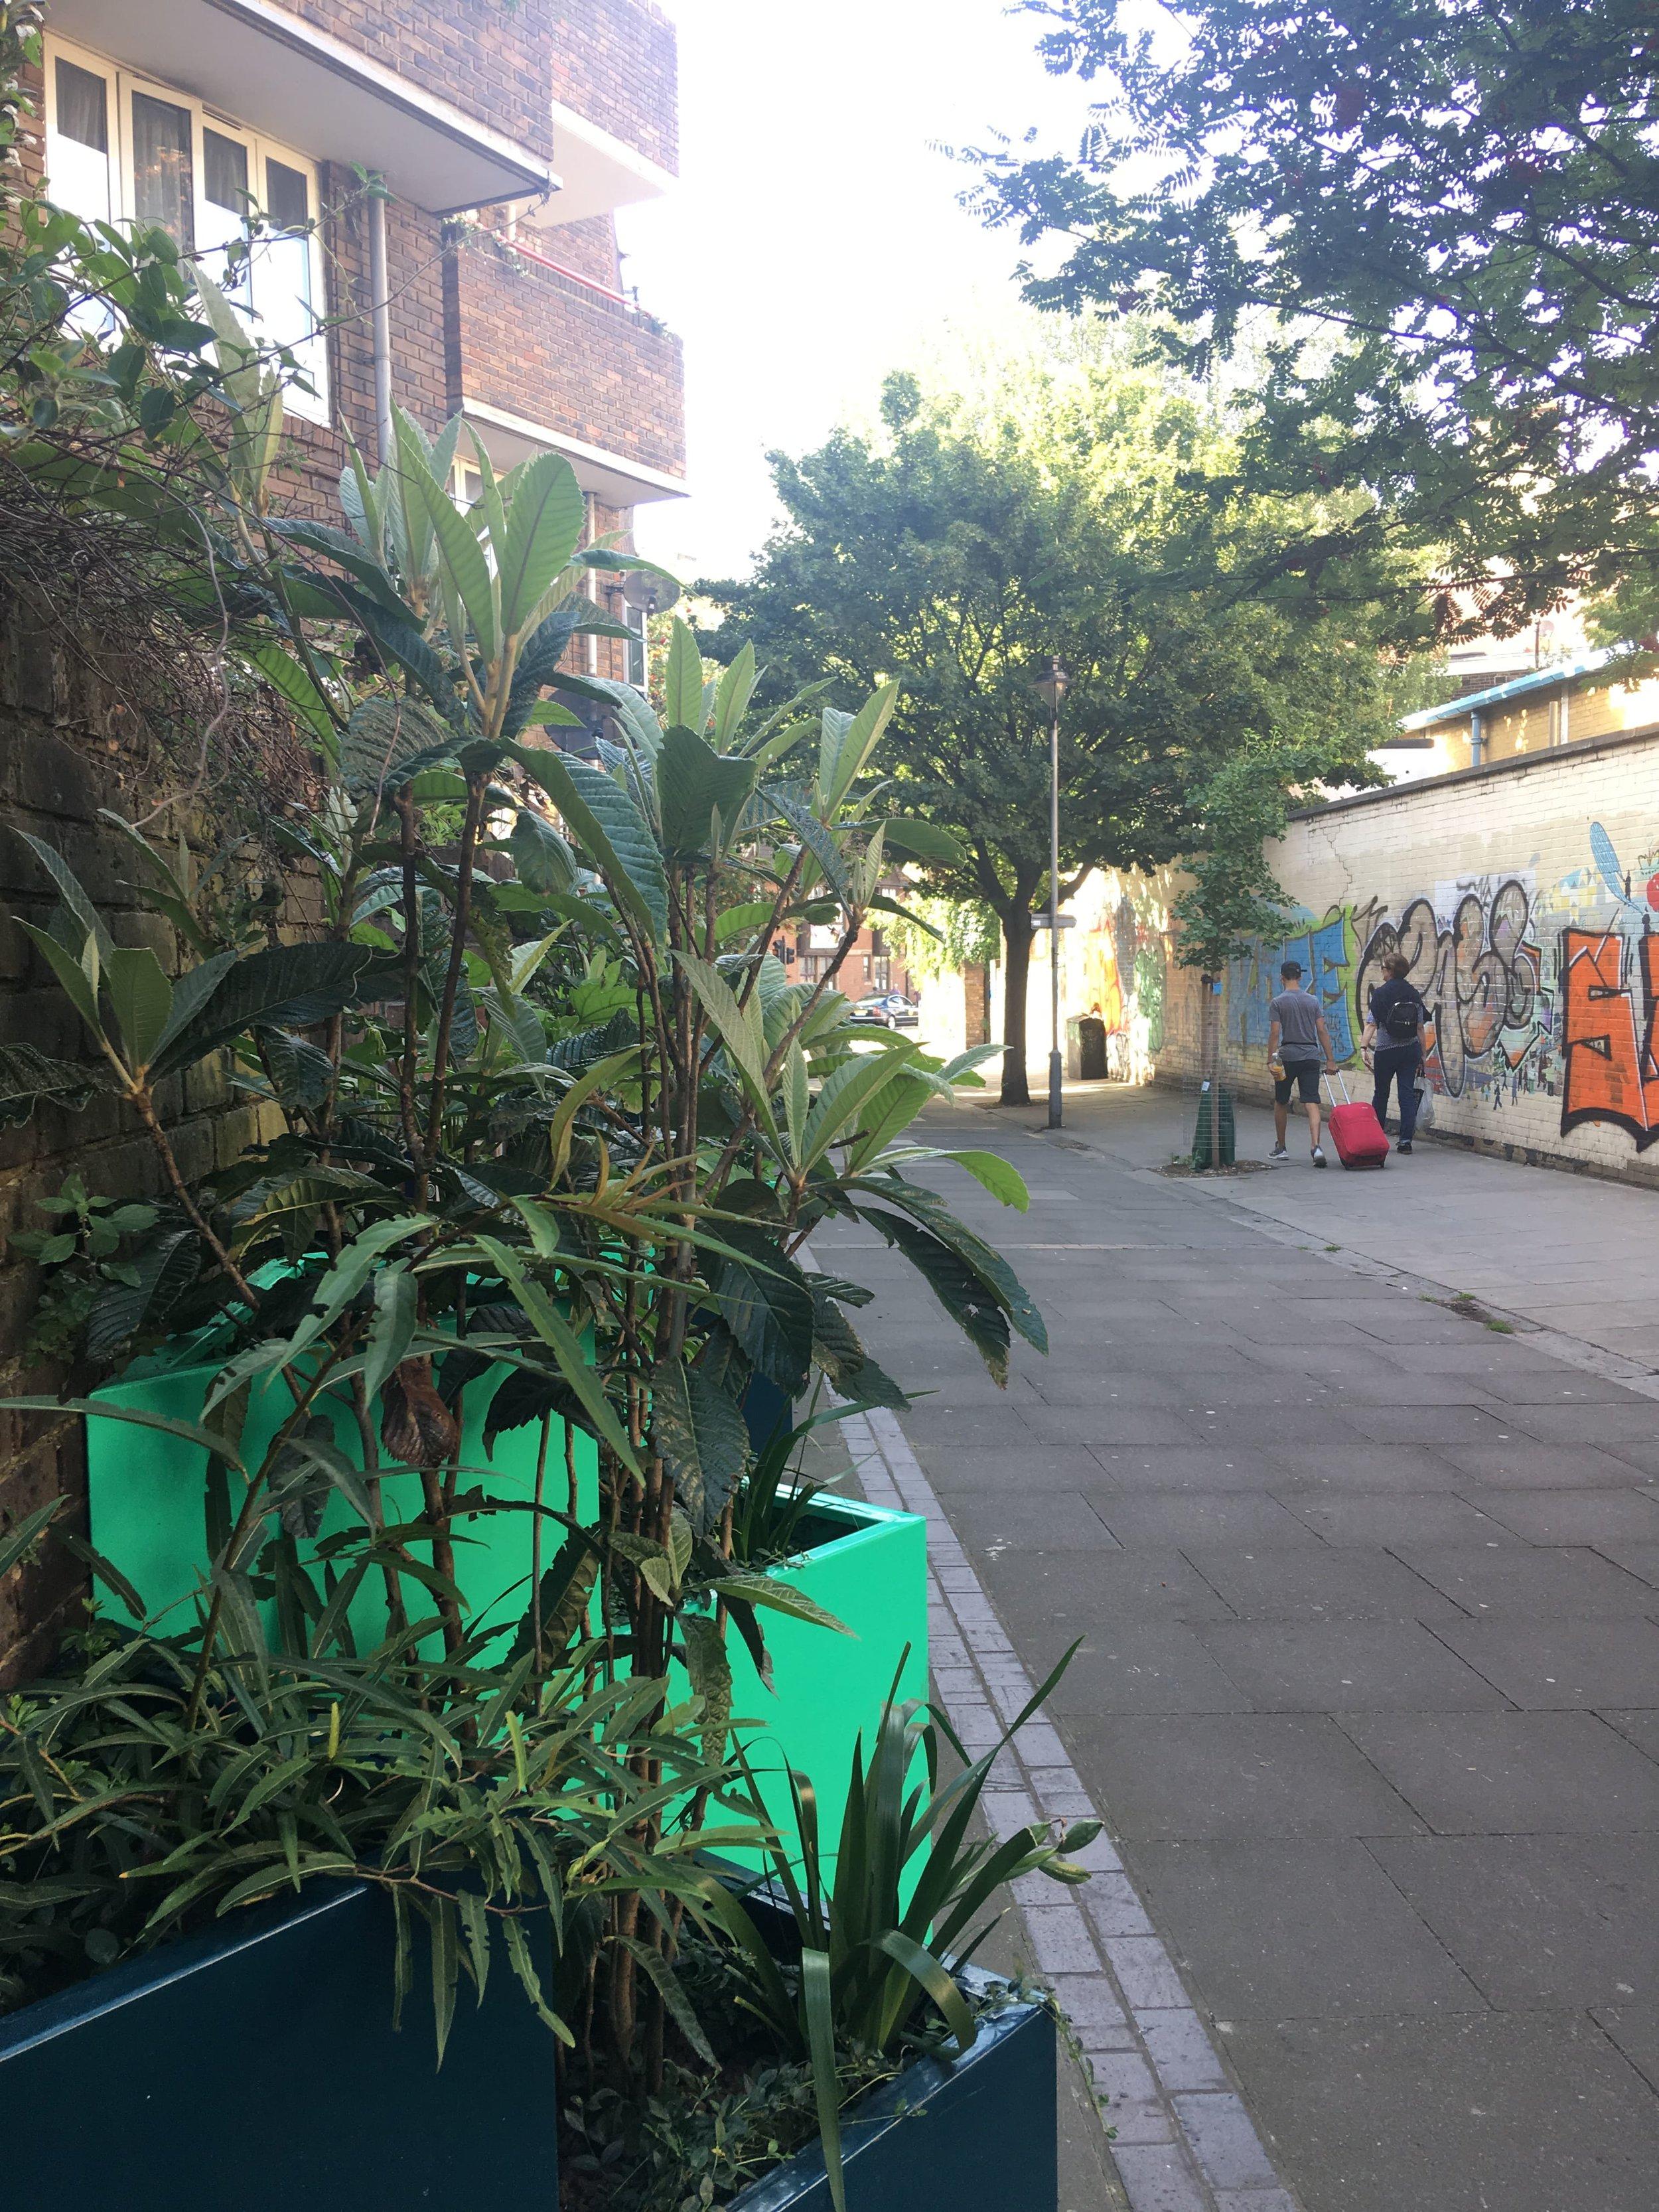 North Gower Street planters